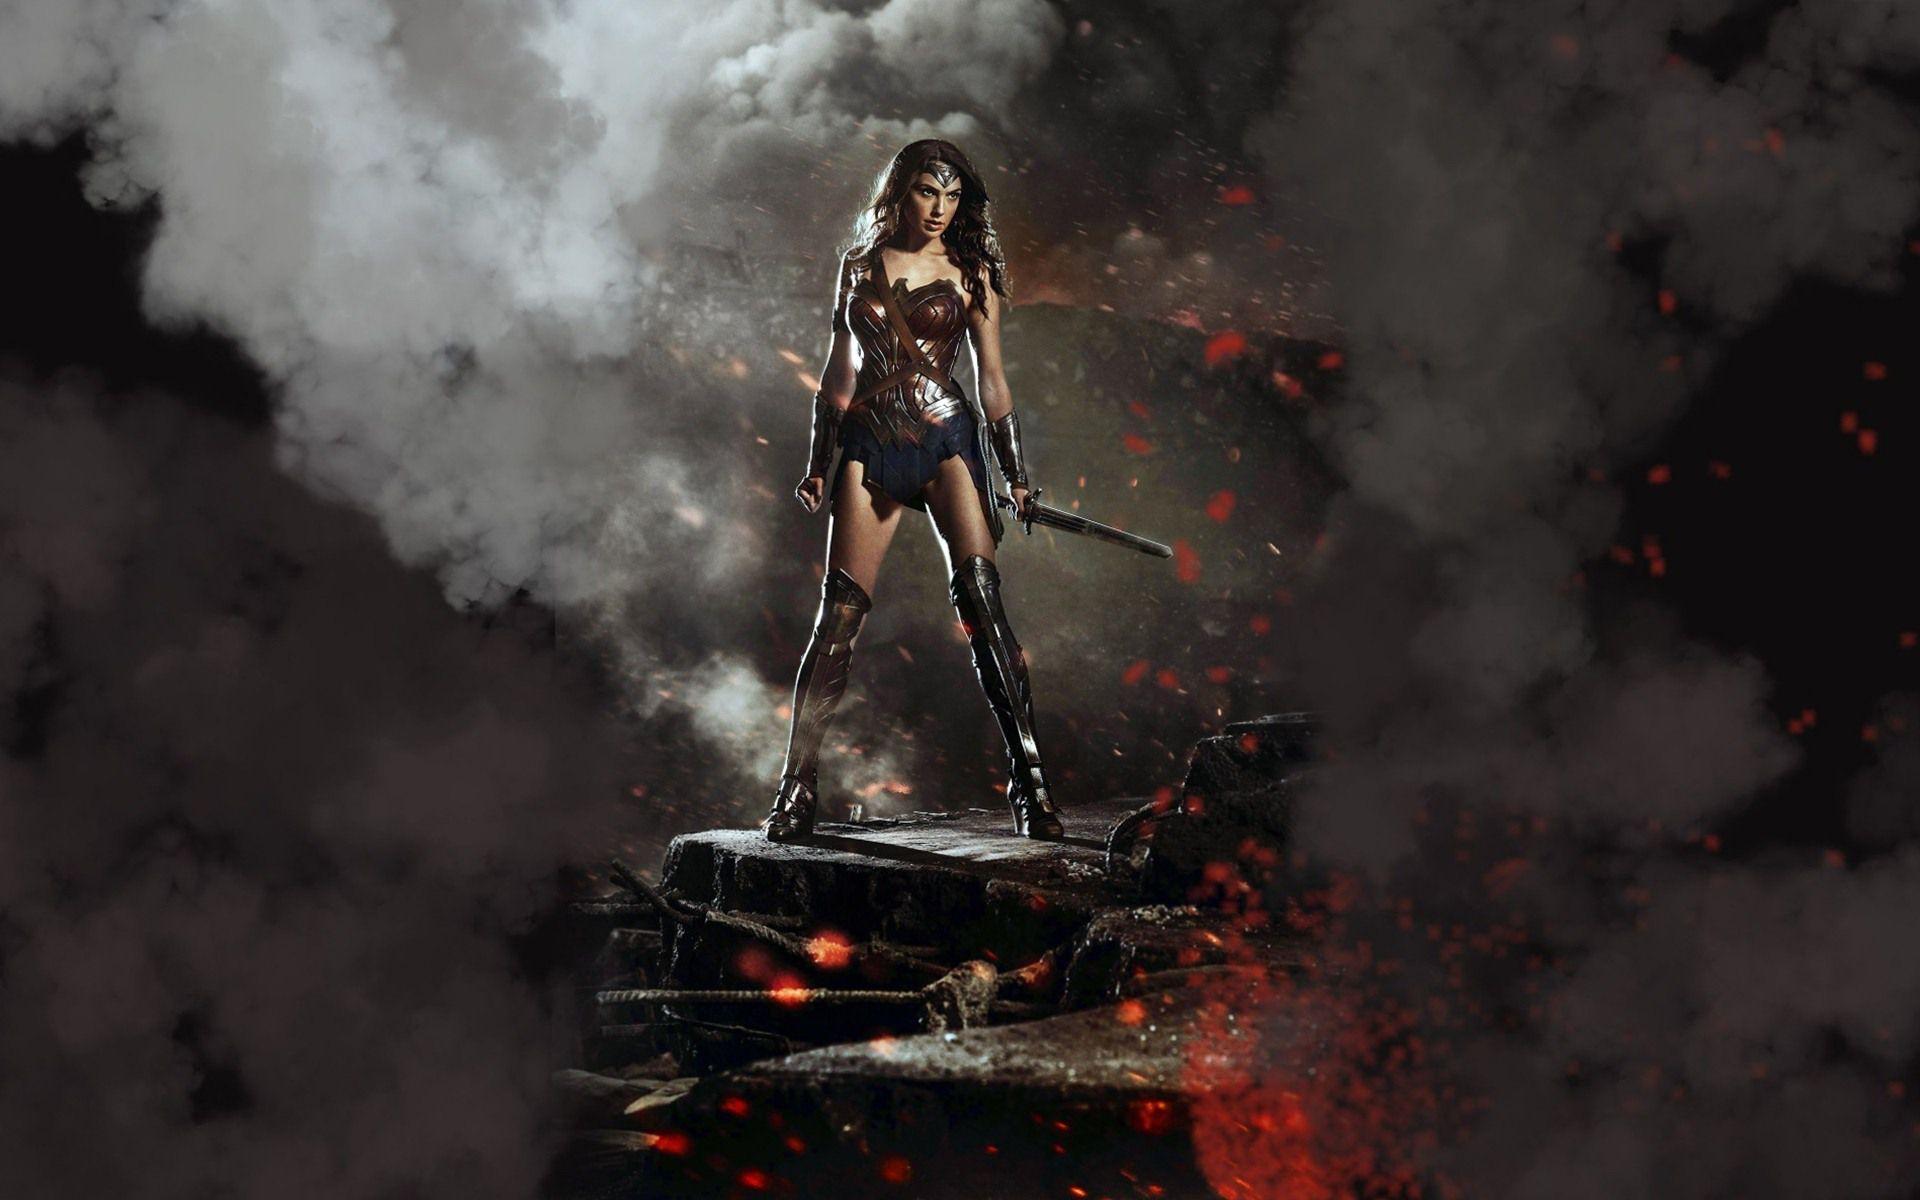 800x1280 Wonder Woman In Batman V Superman Nexus 7samsung Galaxy